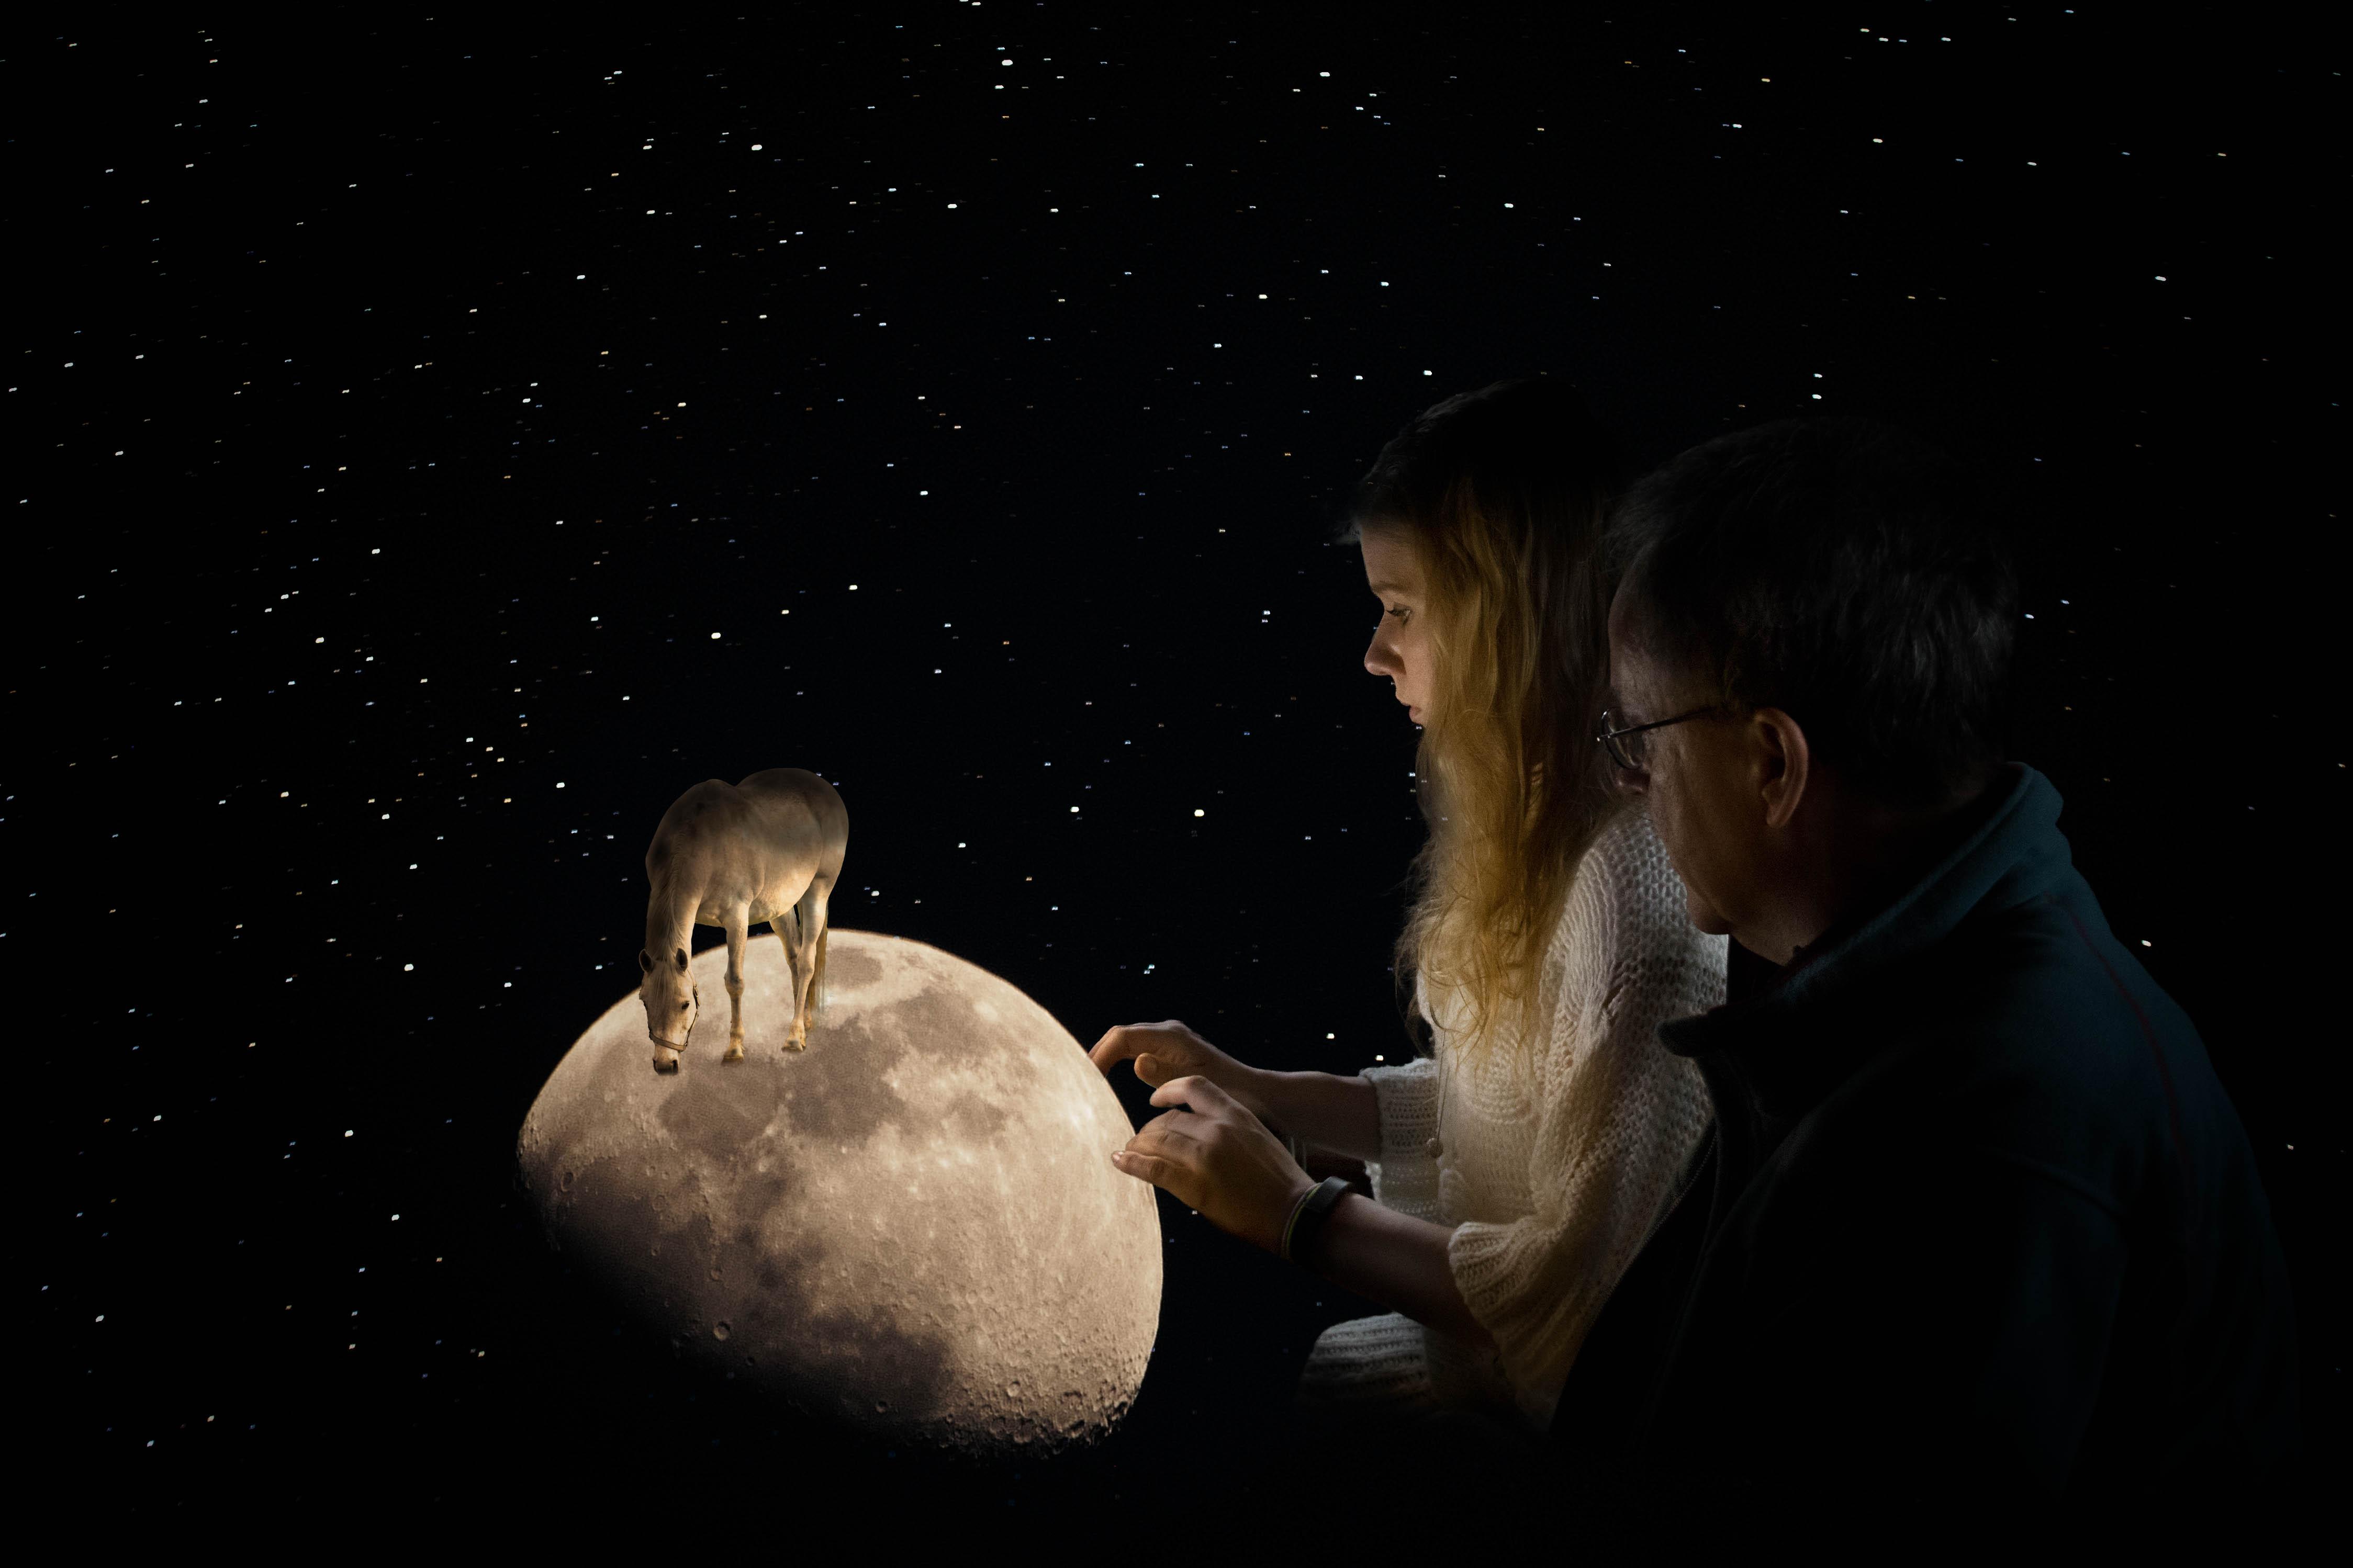 Moon study perla.jpg